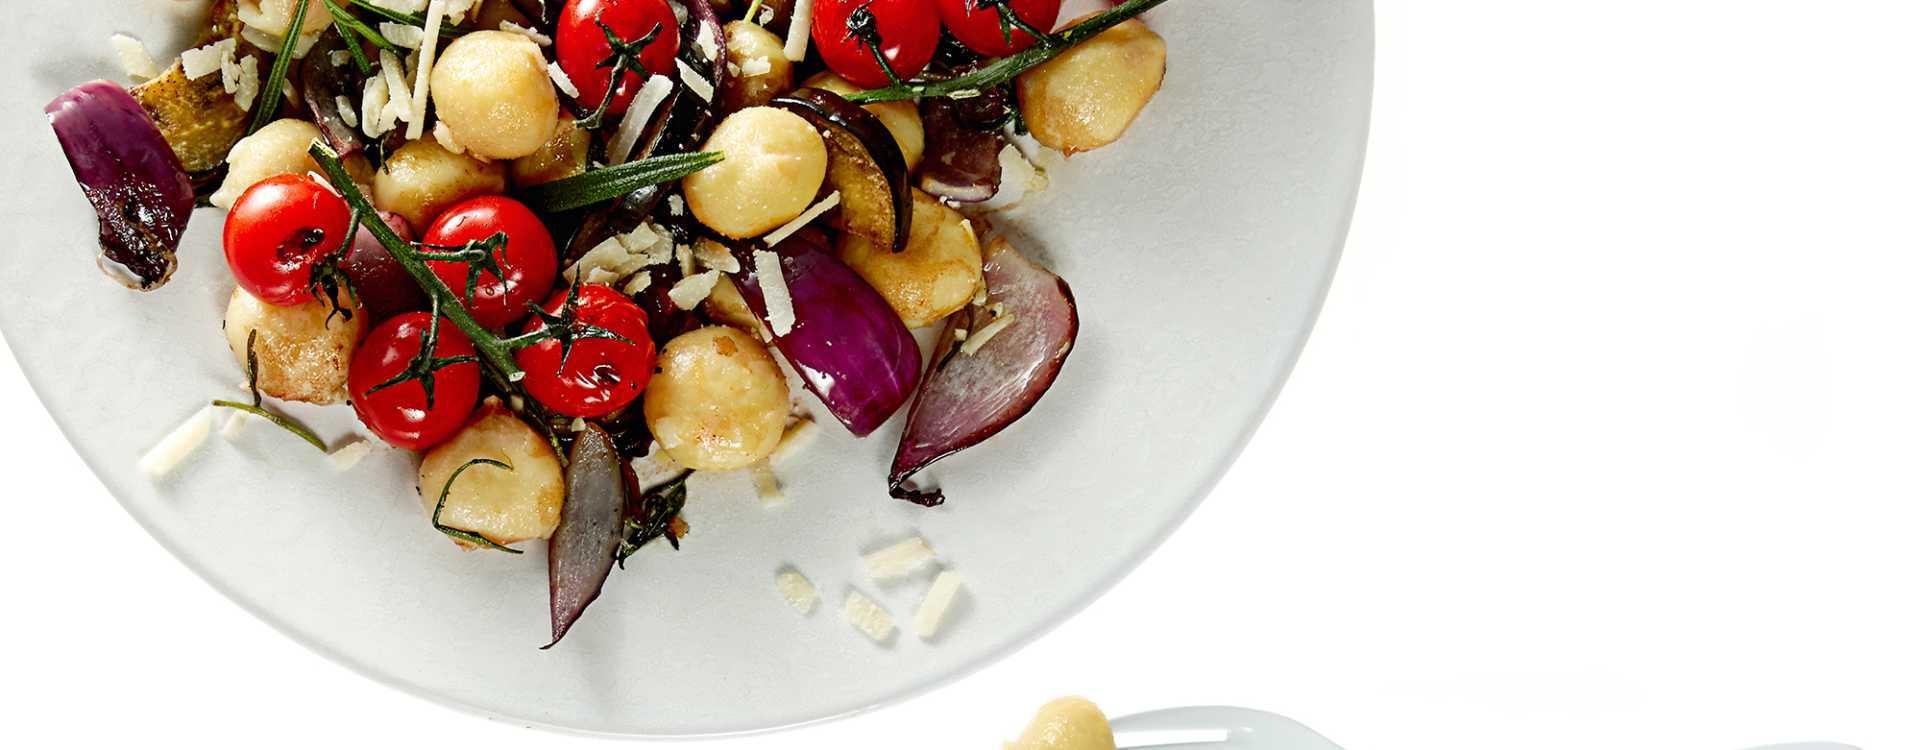 Gnocchi med tomater, aubergine og grana padano